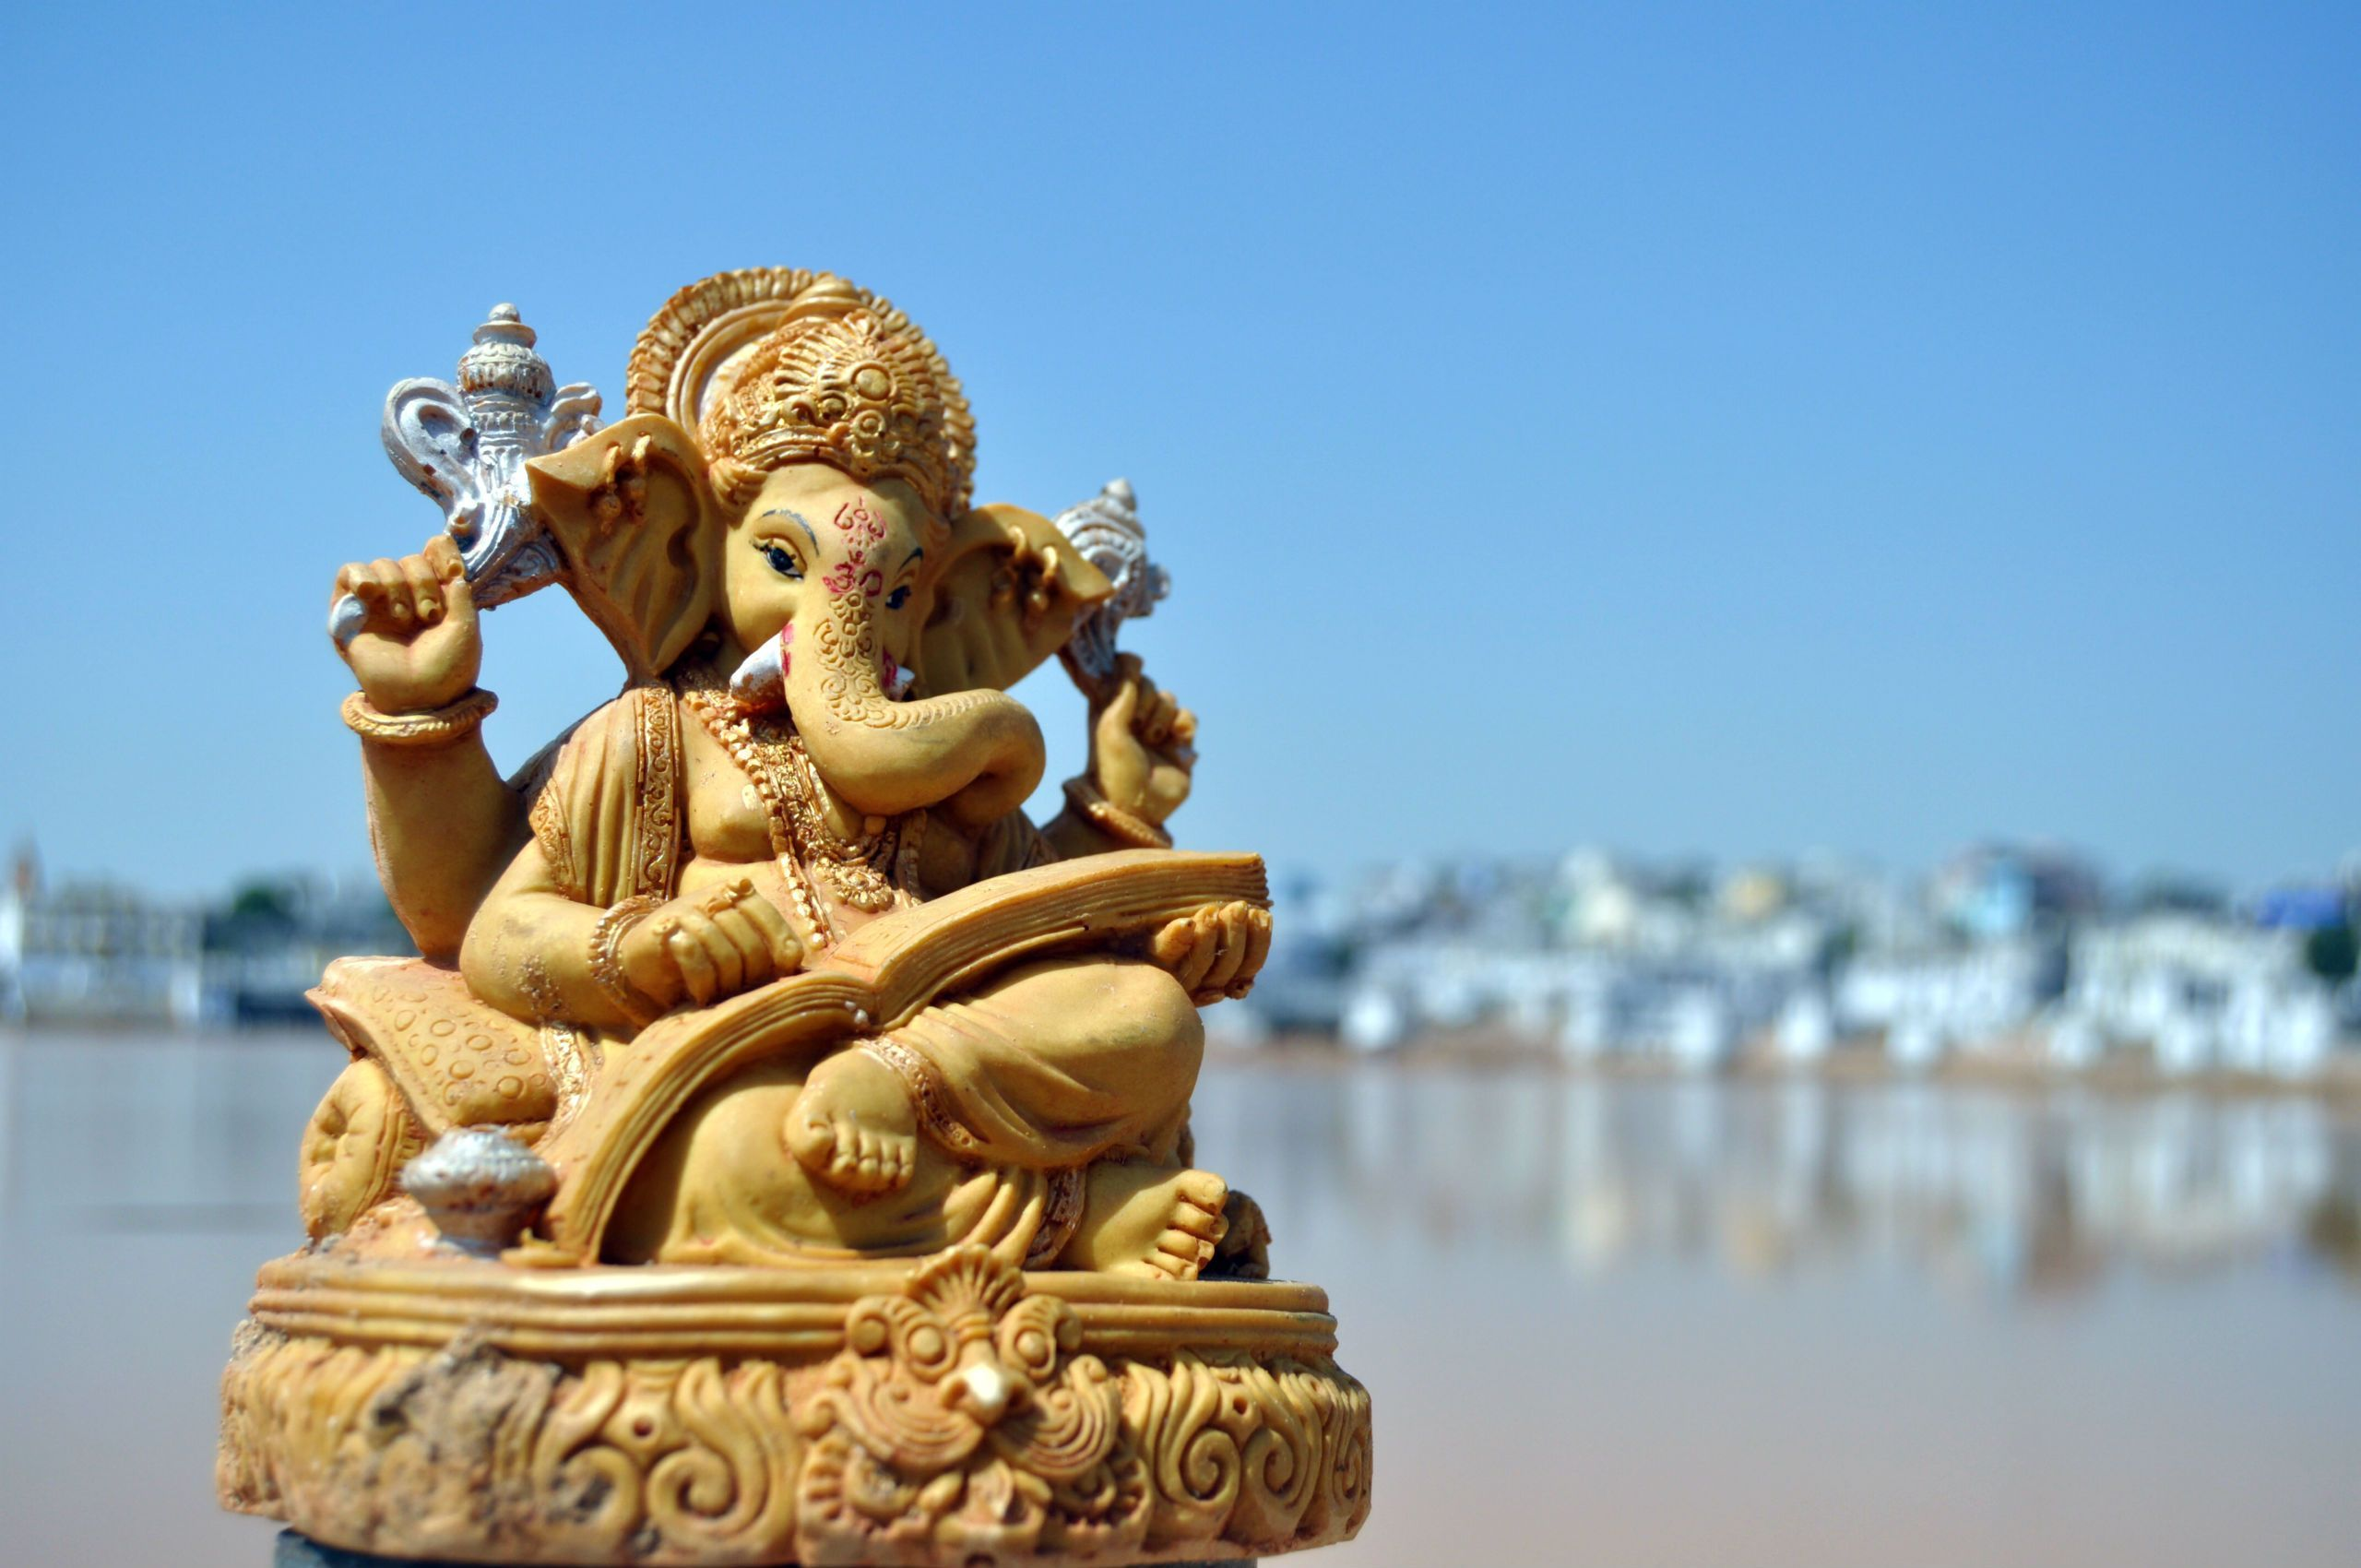 Simple Wallpaper High Quality Lord Ganesha - 1016a7f2ccdaf01d8a69ff8f85b994a2  Photograph_232278.jpg